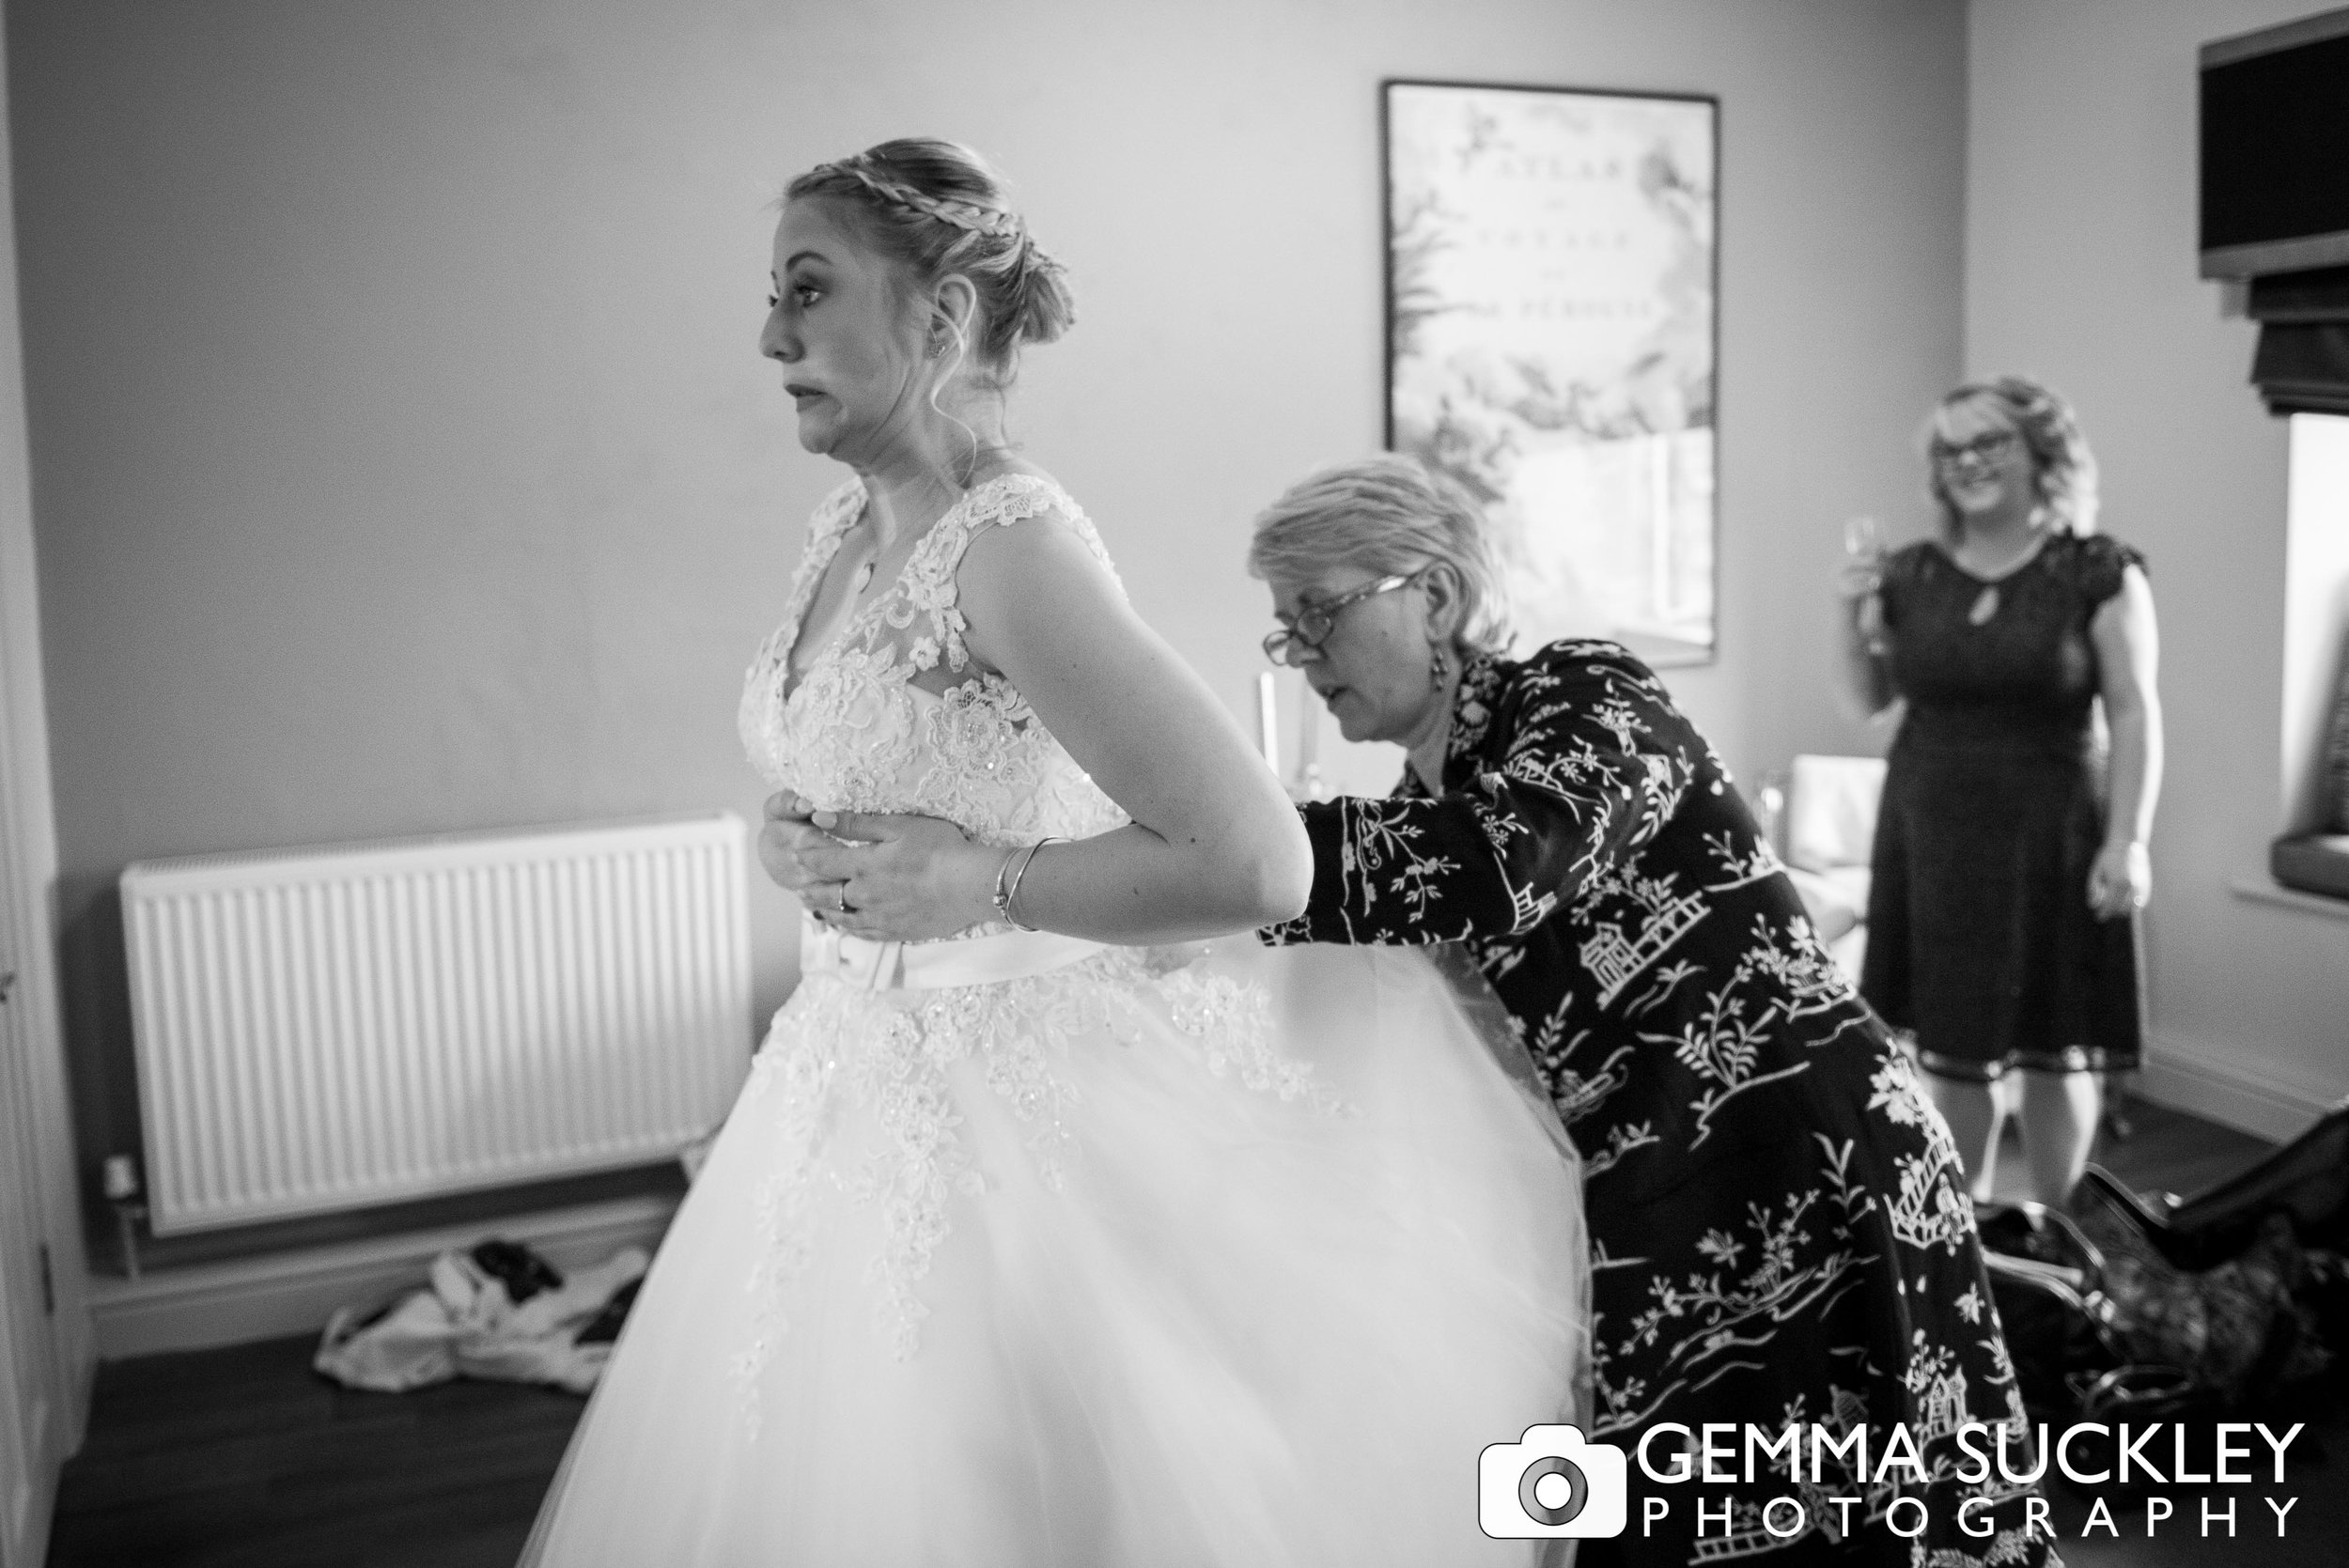 Amelias-wedding-dress-Clitheroe.jpg